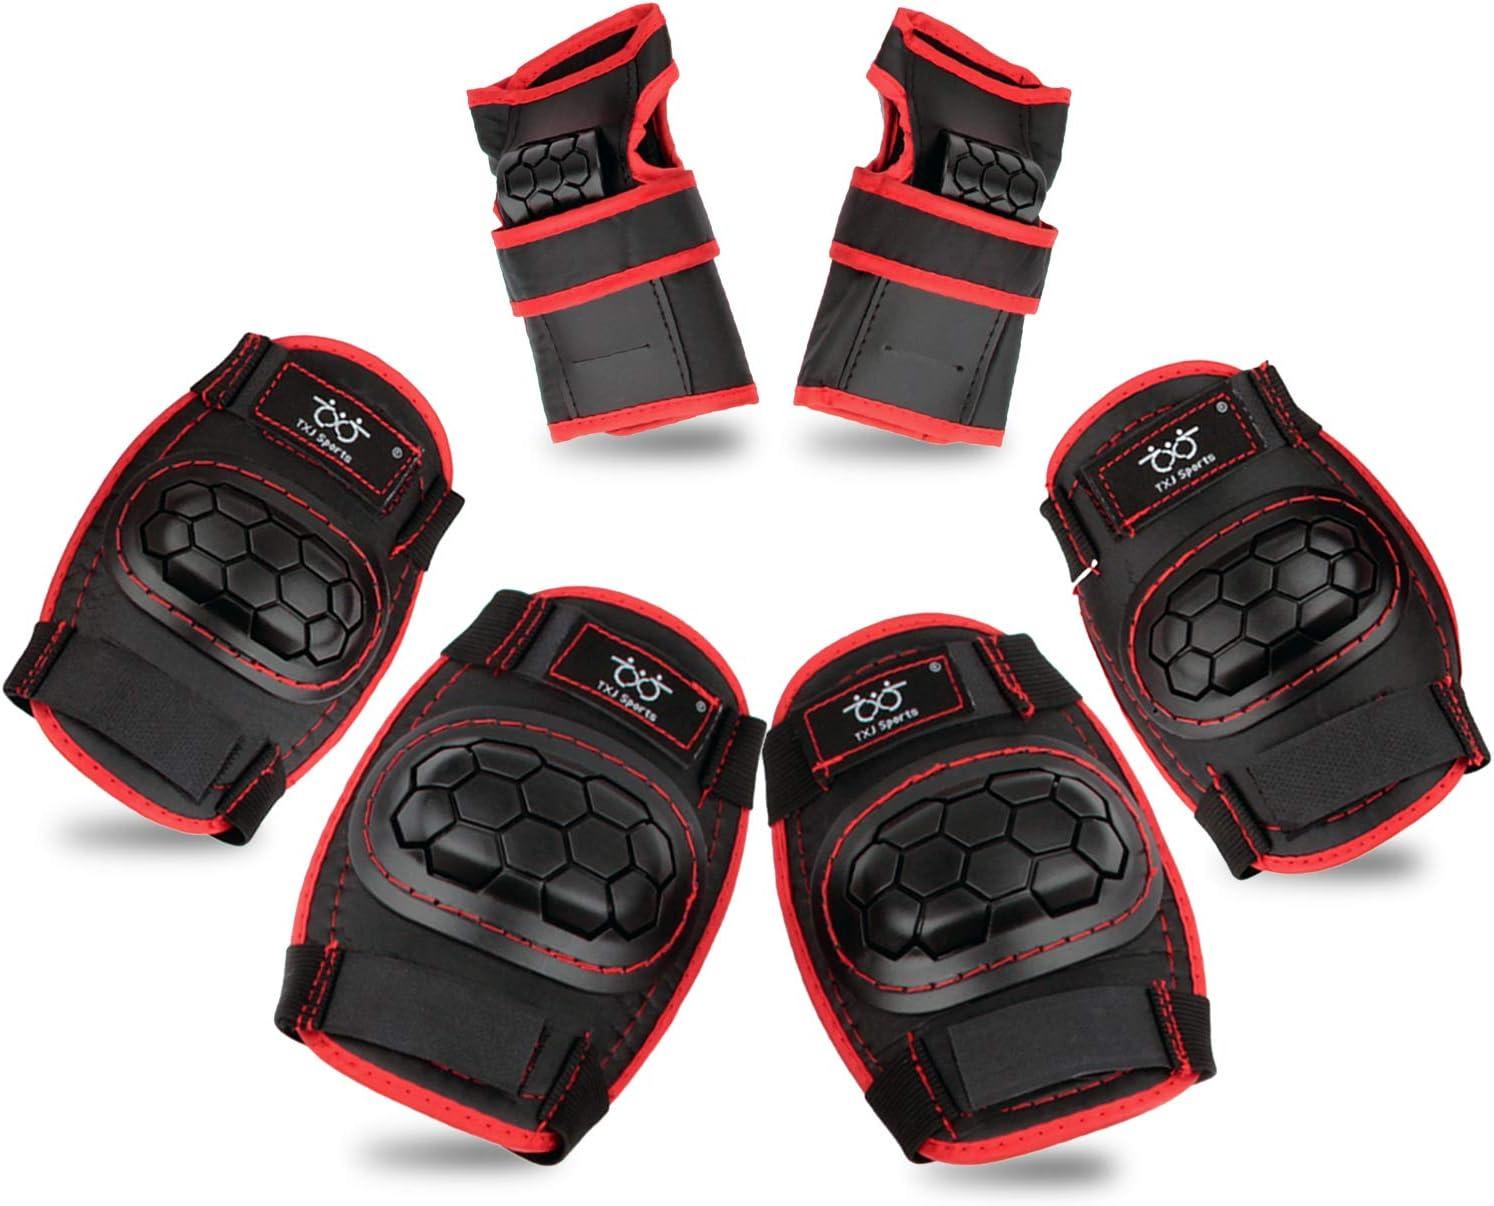 6x Skating Protective Gear Set Elbow Knee Wrist Pads Bike Skateboard Adult Kids